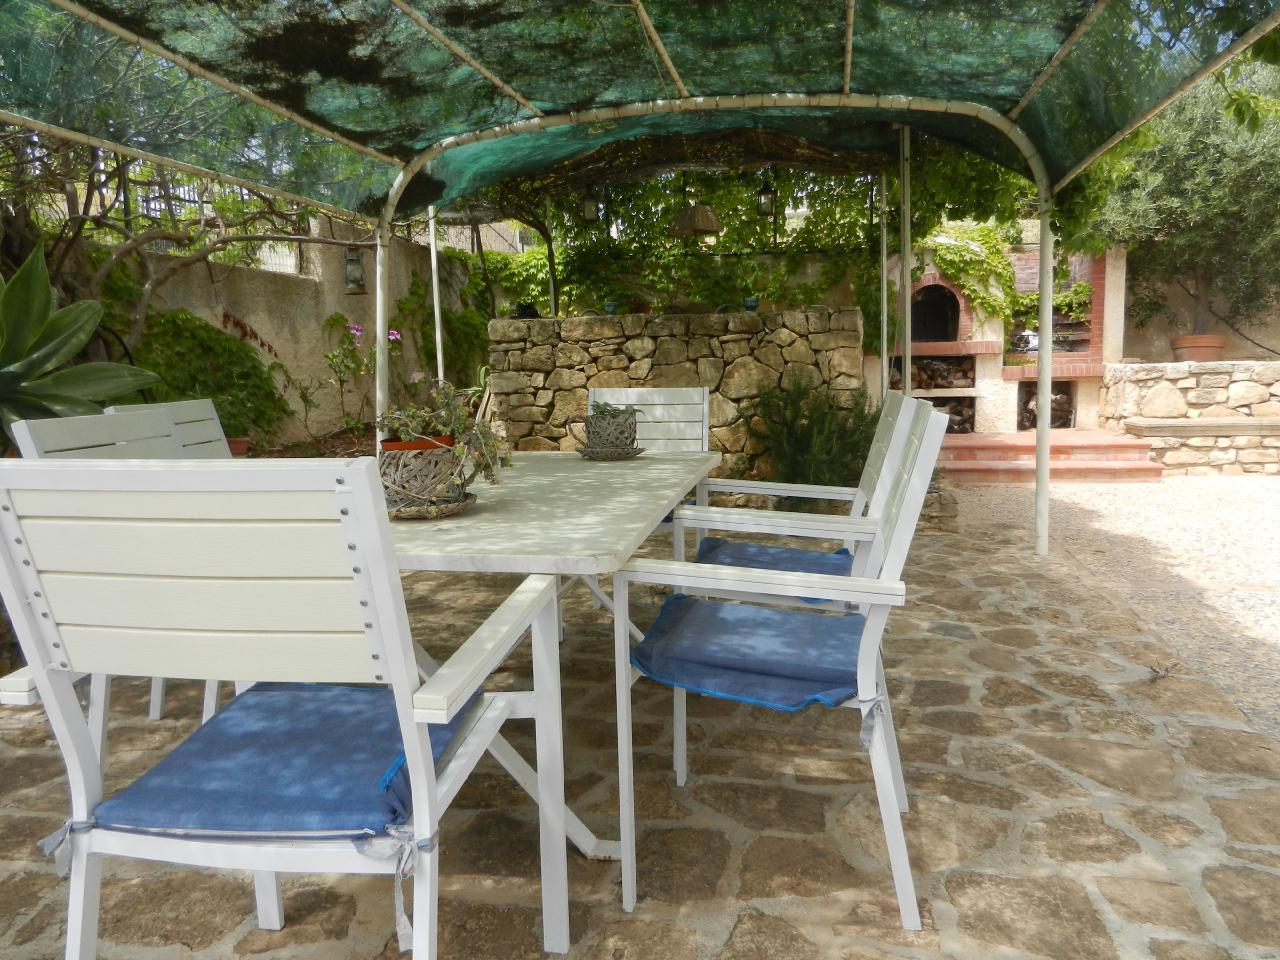 Maison de vacances Villa Mediterranea (57184), Menfi, Agrigento, Sicile, Italie, image 24